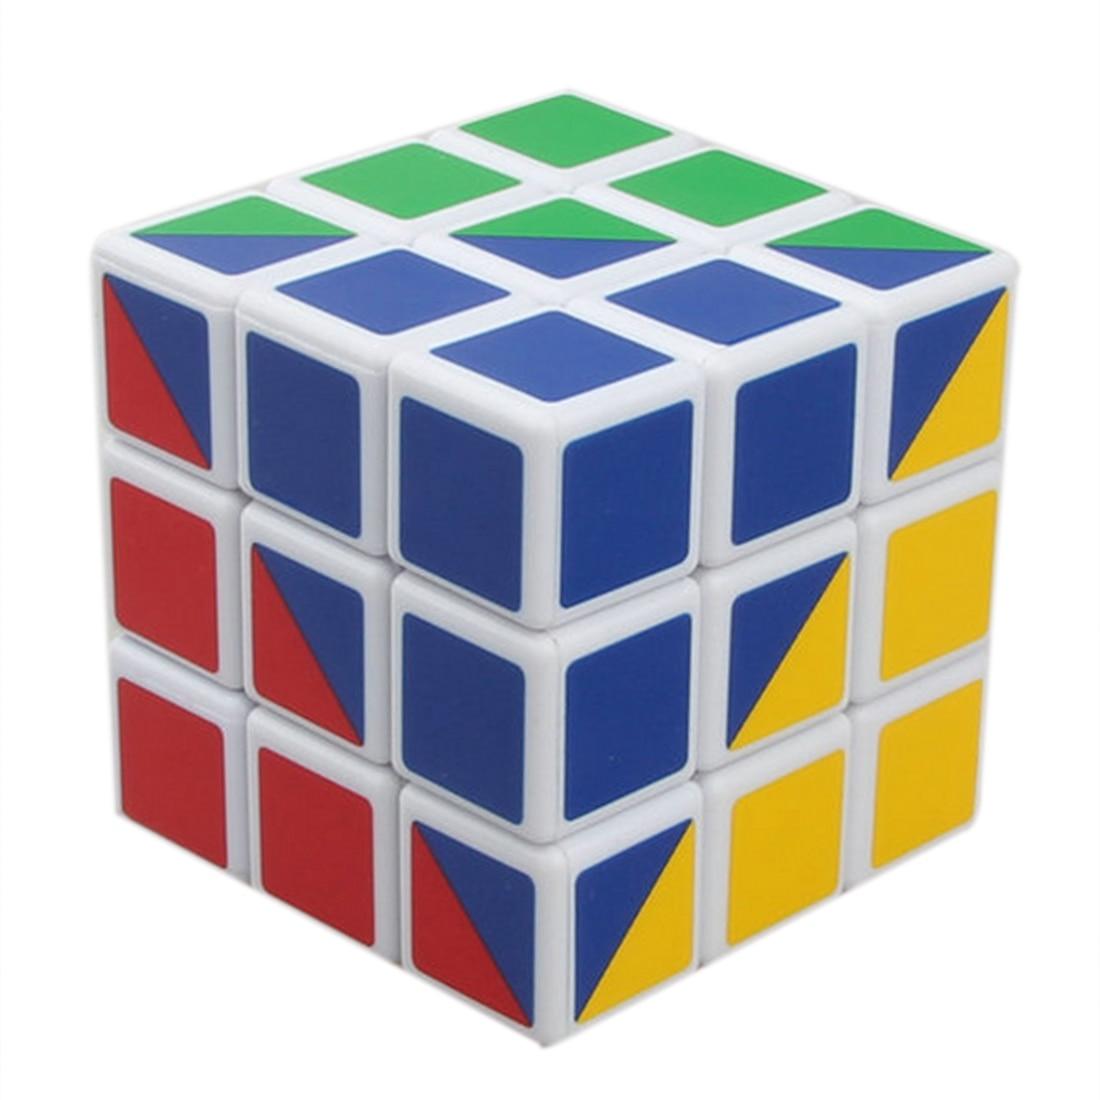 X-cube Most Difficult 3X3X3 56mm Magic Speed Cube Four Colors Magic CubeX-cube Most Difficult 3X3X3 56mm Magic Speed Cube Four Colors Magic Cube